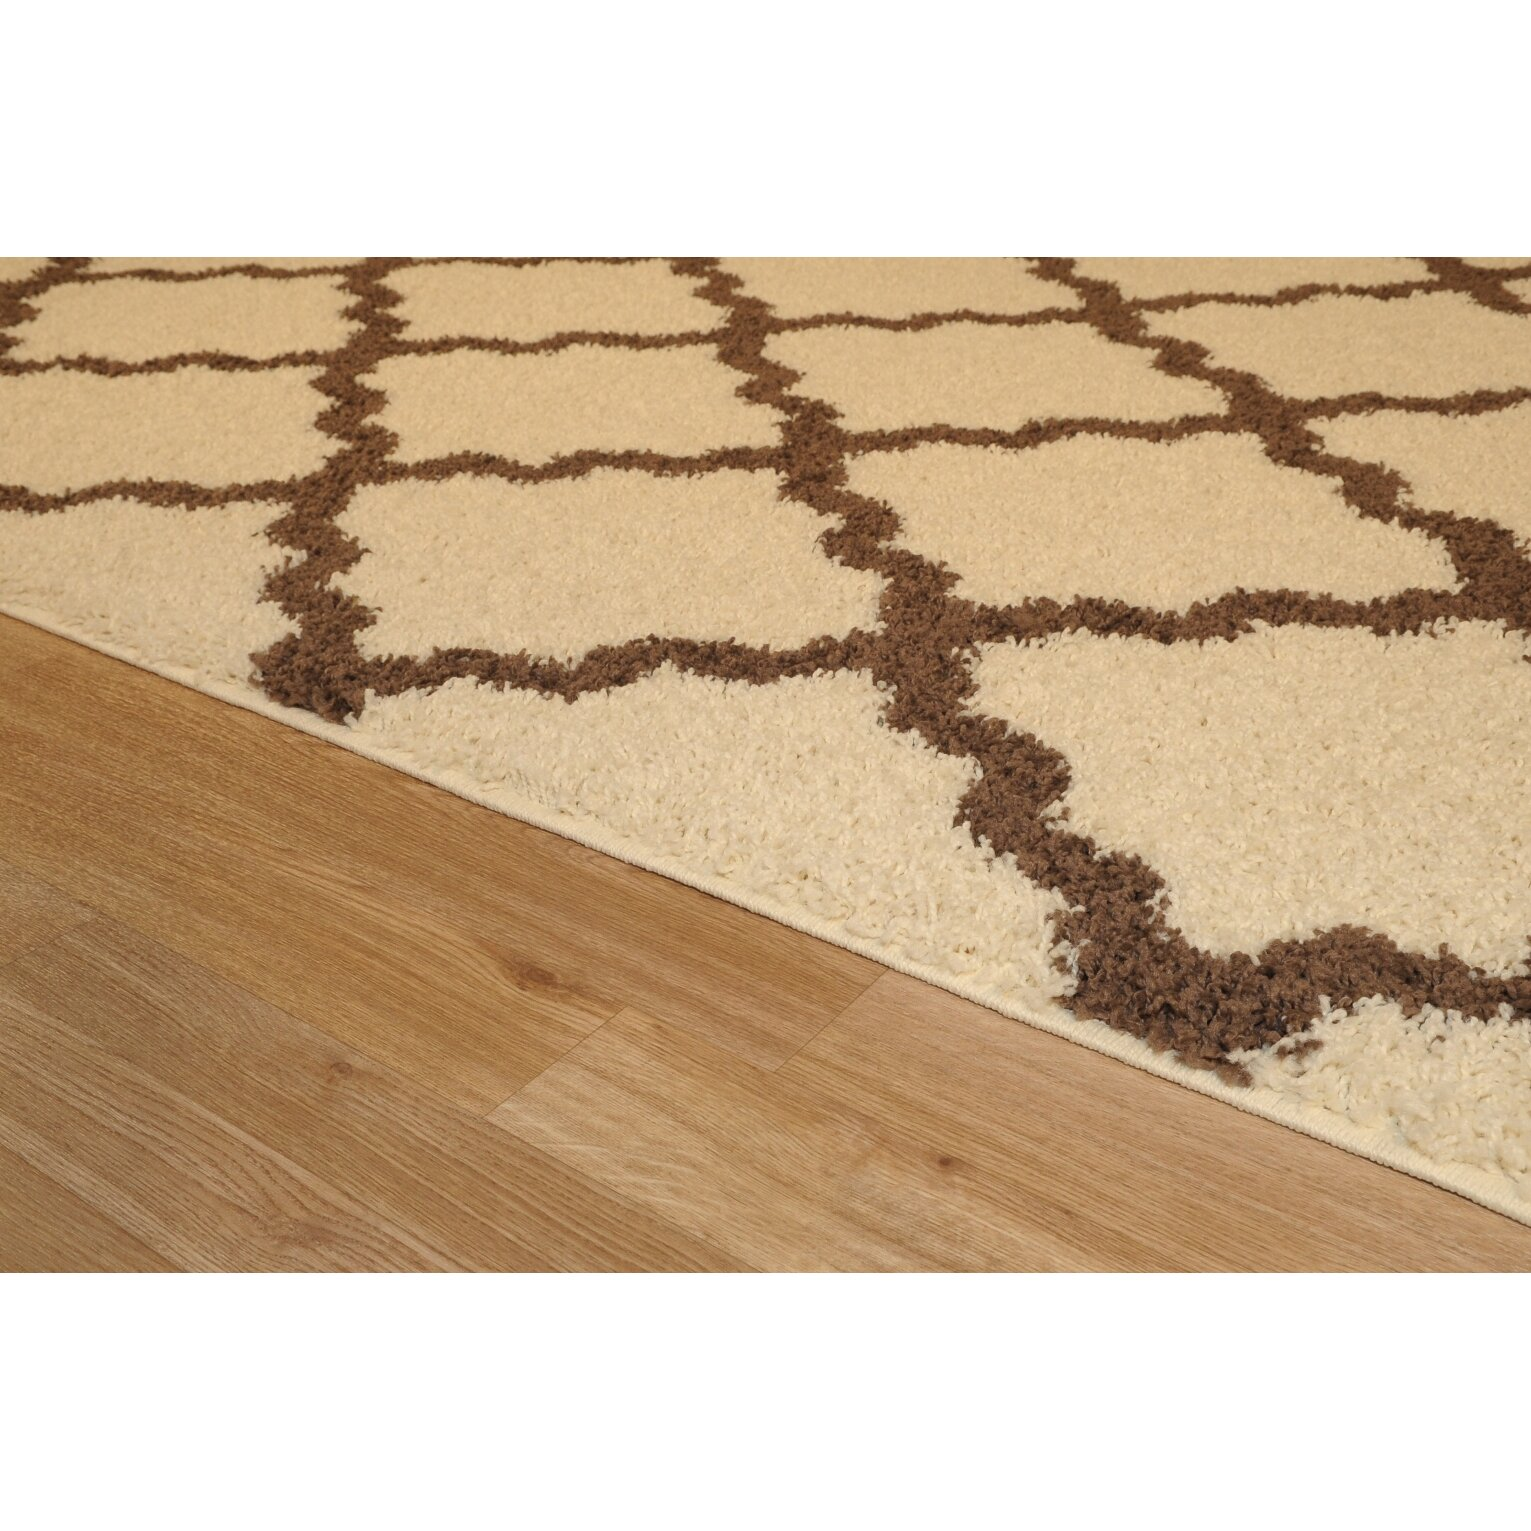 Brown Shag Area Rugs brown shag area rug | roselawnlutheran